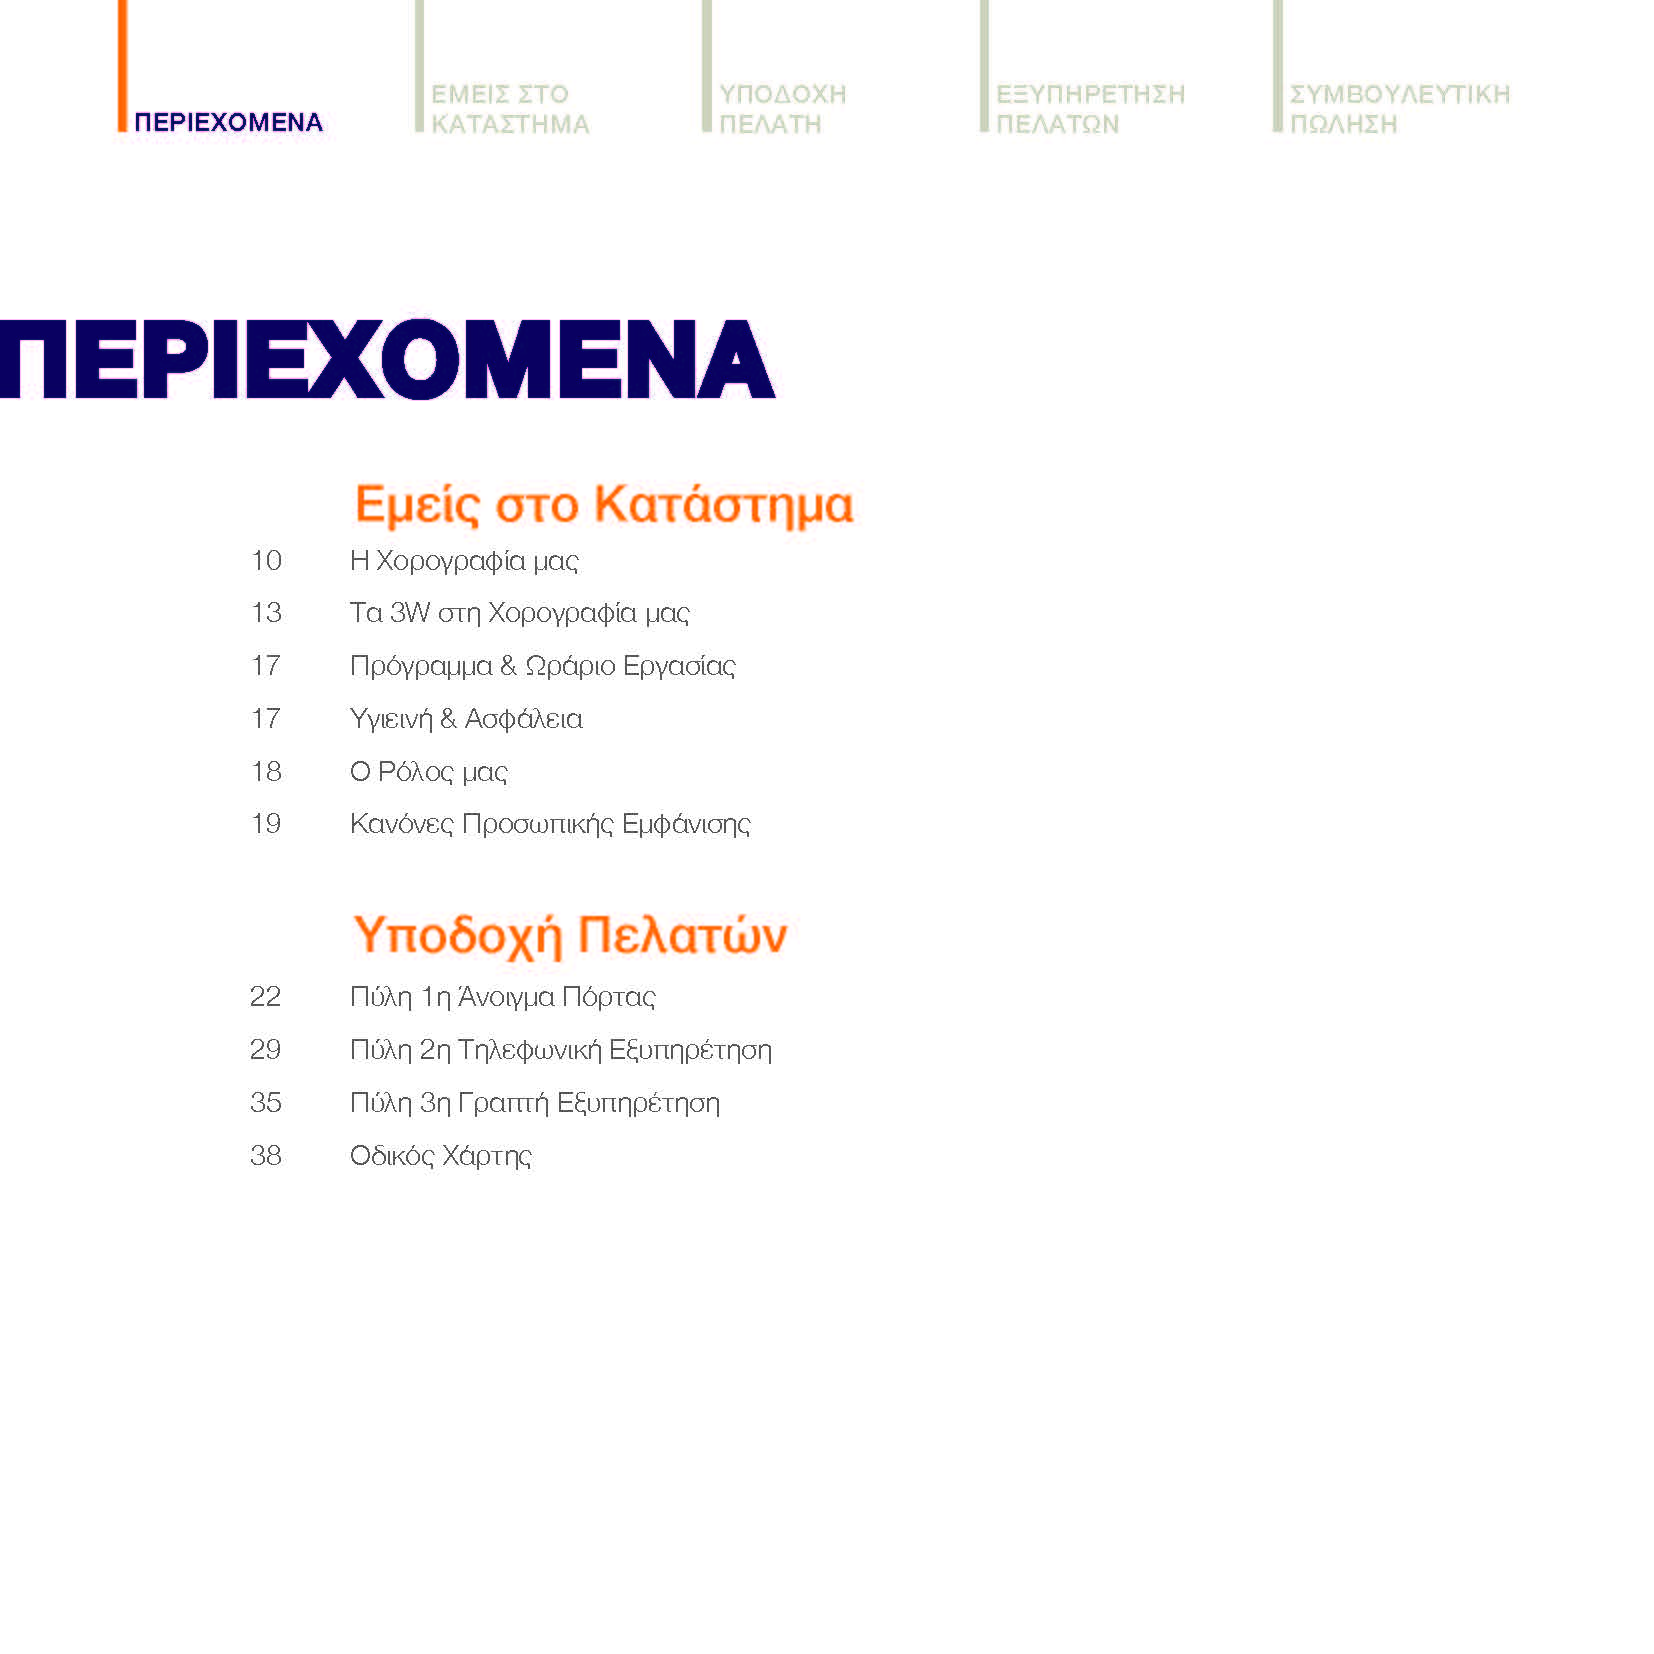 https://www.jib.gr/wp-content/uploads/2020/09/OPTIMA-BANK-BOOKLET-WEB_Page_008.jpg